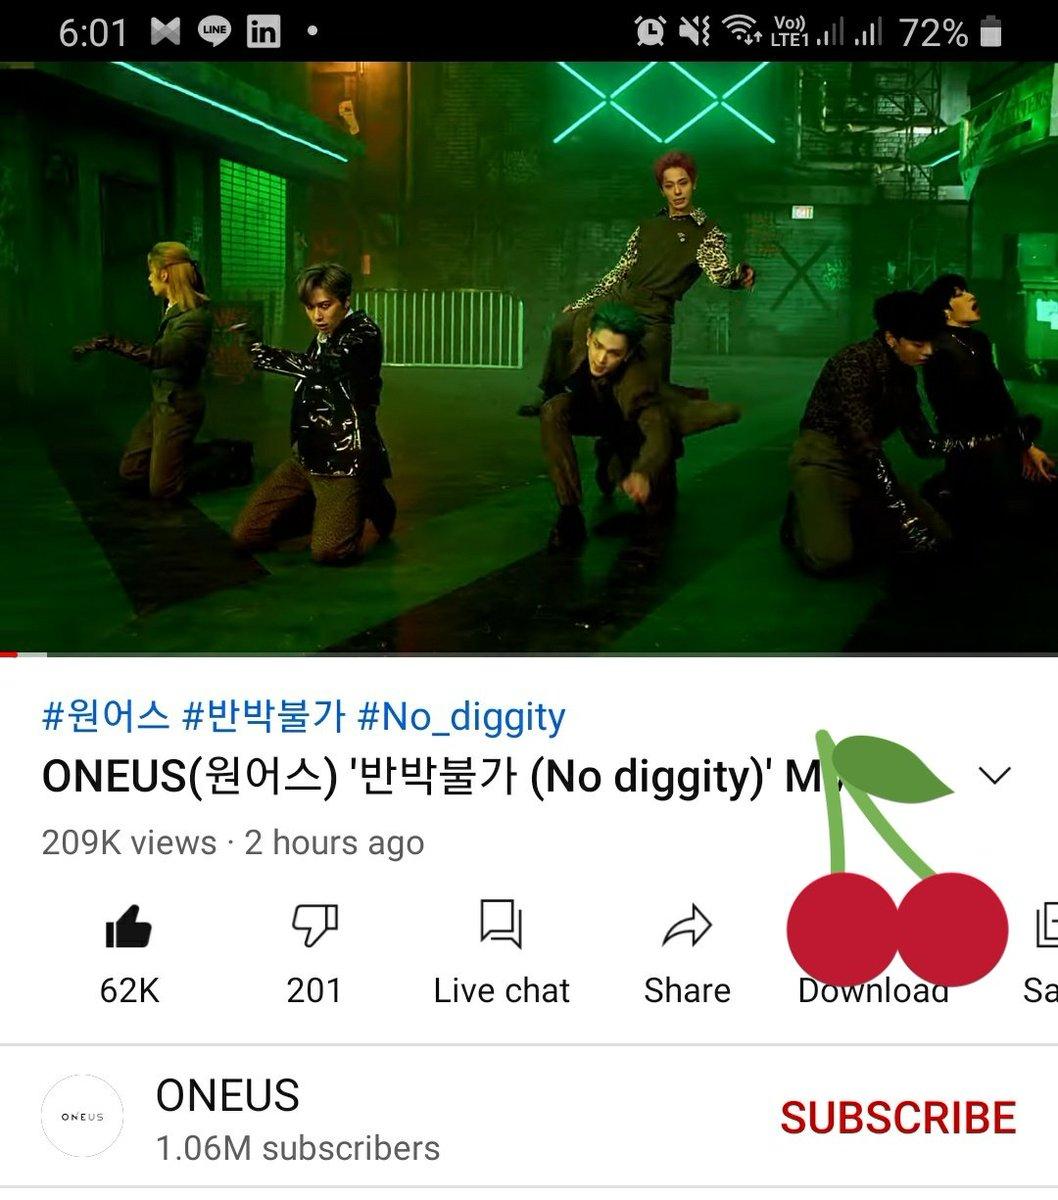 @euniseong #ONEUS #ONEUS_DEVIL_NoDiggity  MV nya kerenn!! Pertama kalinya nonton MV dari boyband ONEUS ganyangka bakal keren. Lagunya juga oke!   Note: awal, fav, tengah, akhir 💫